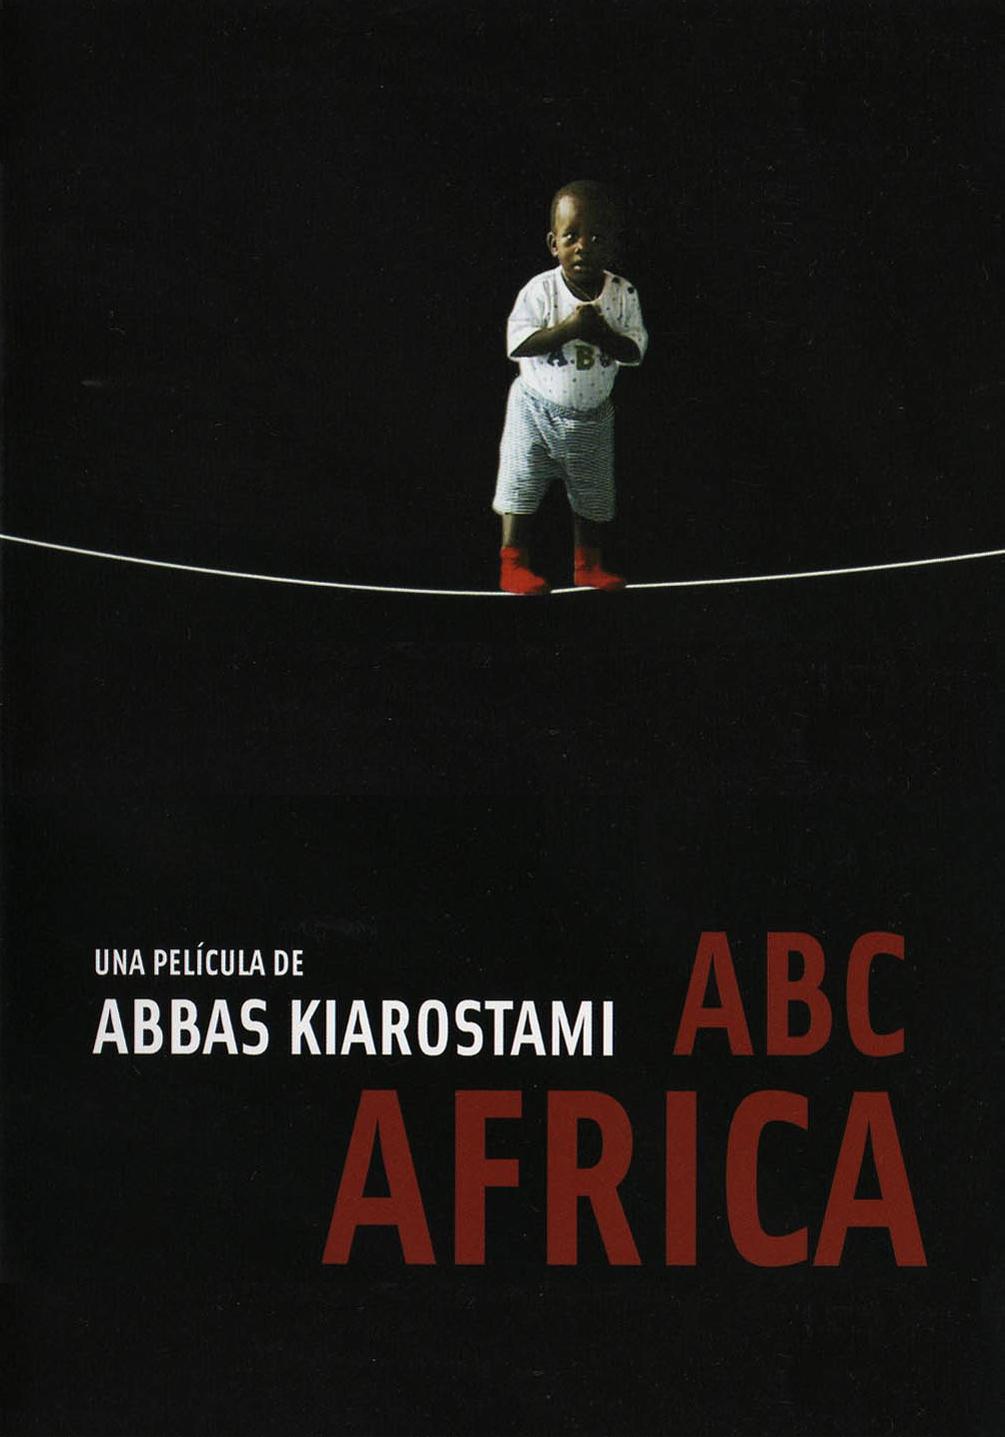 ABC África